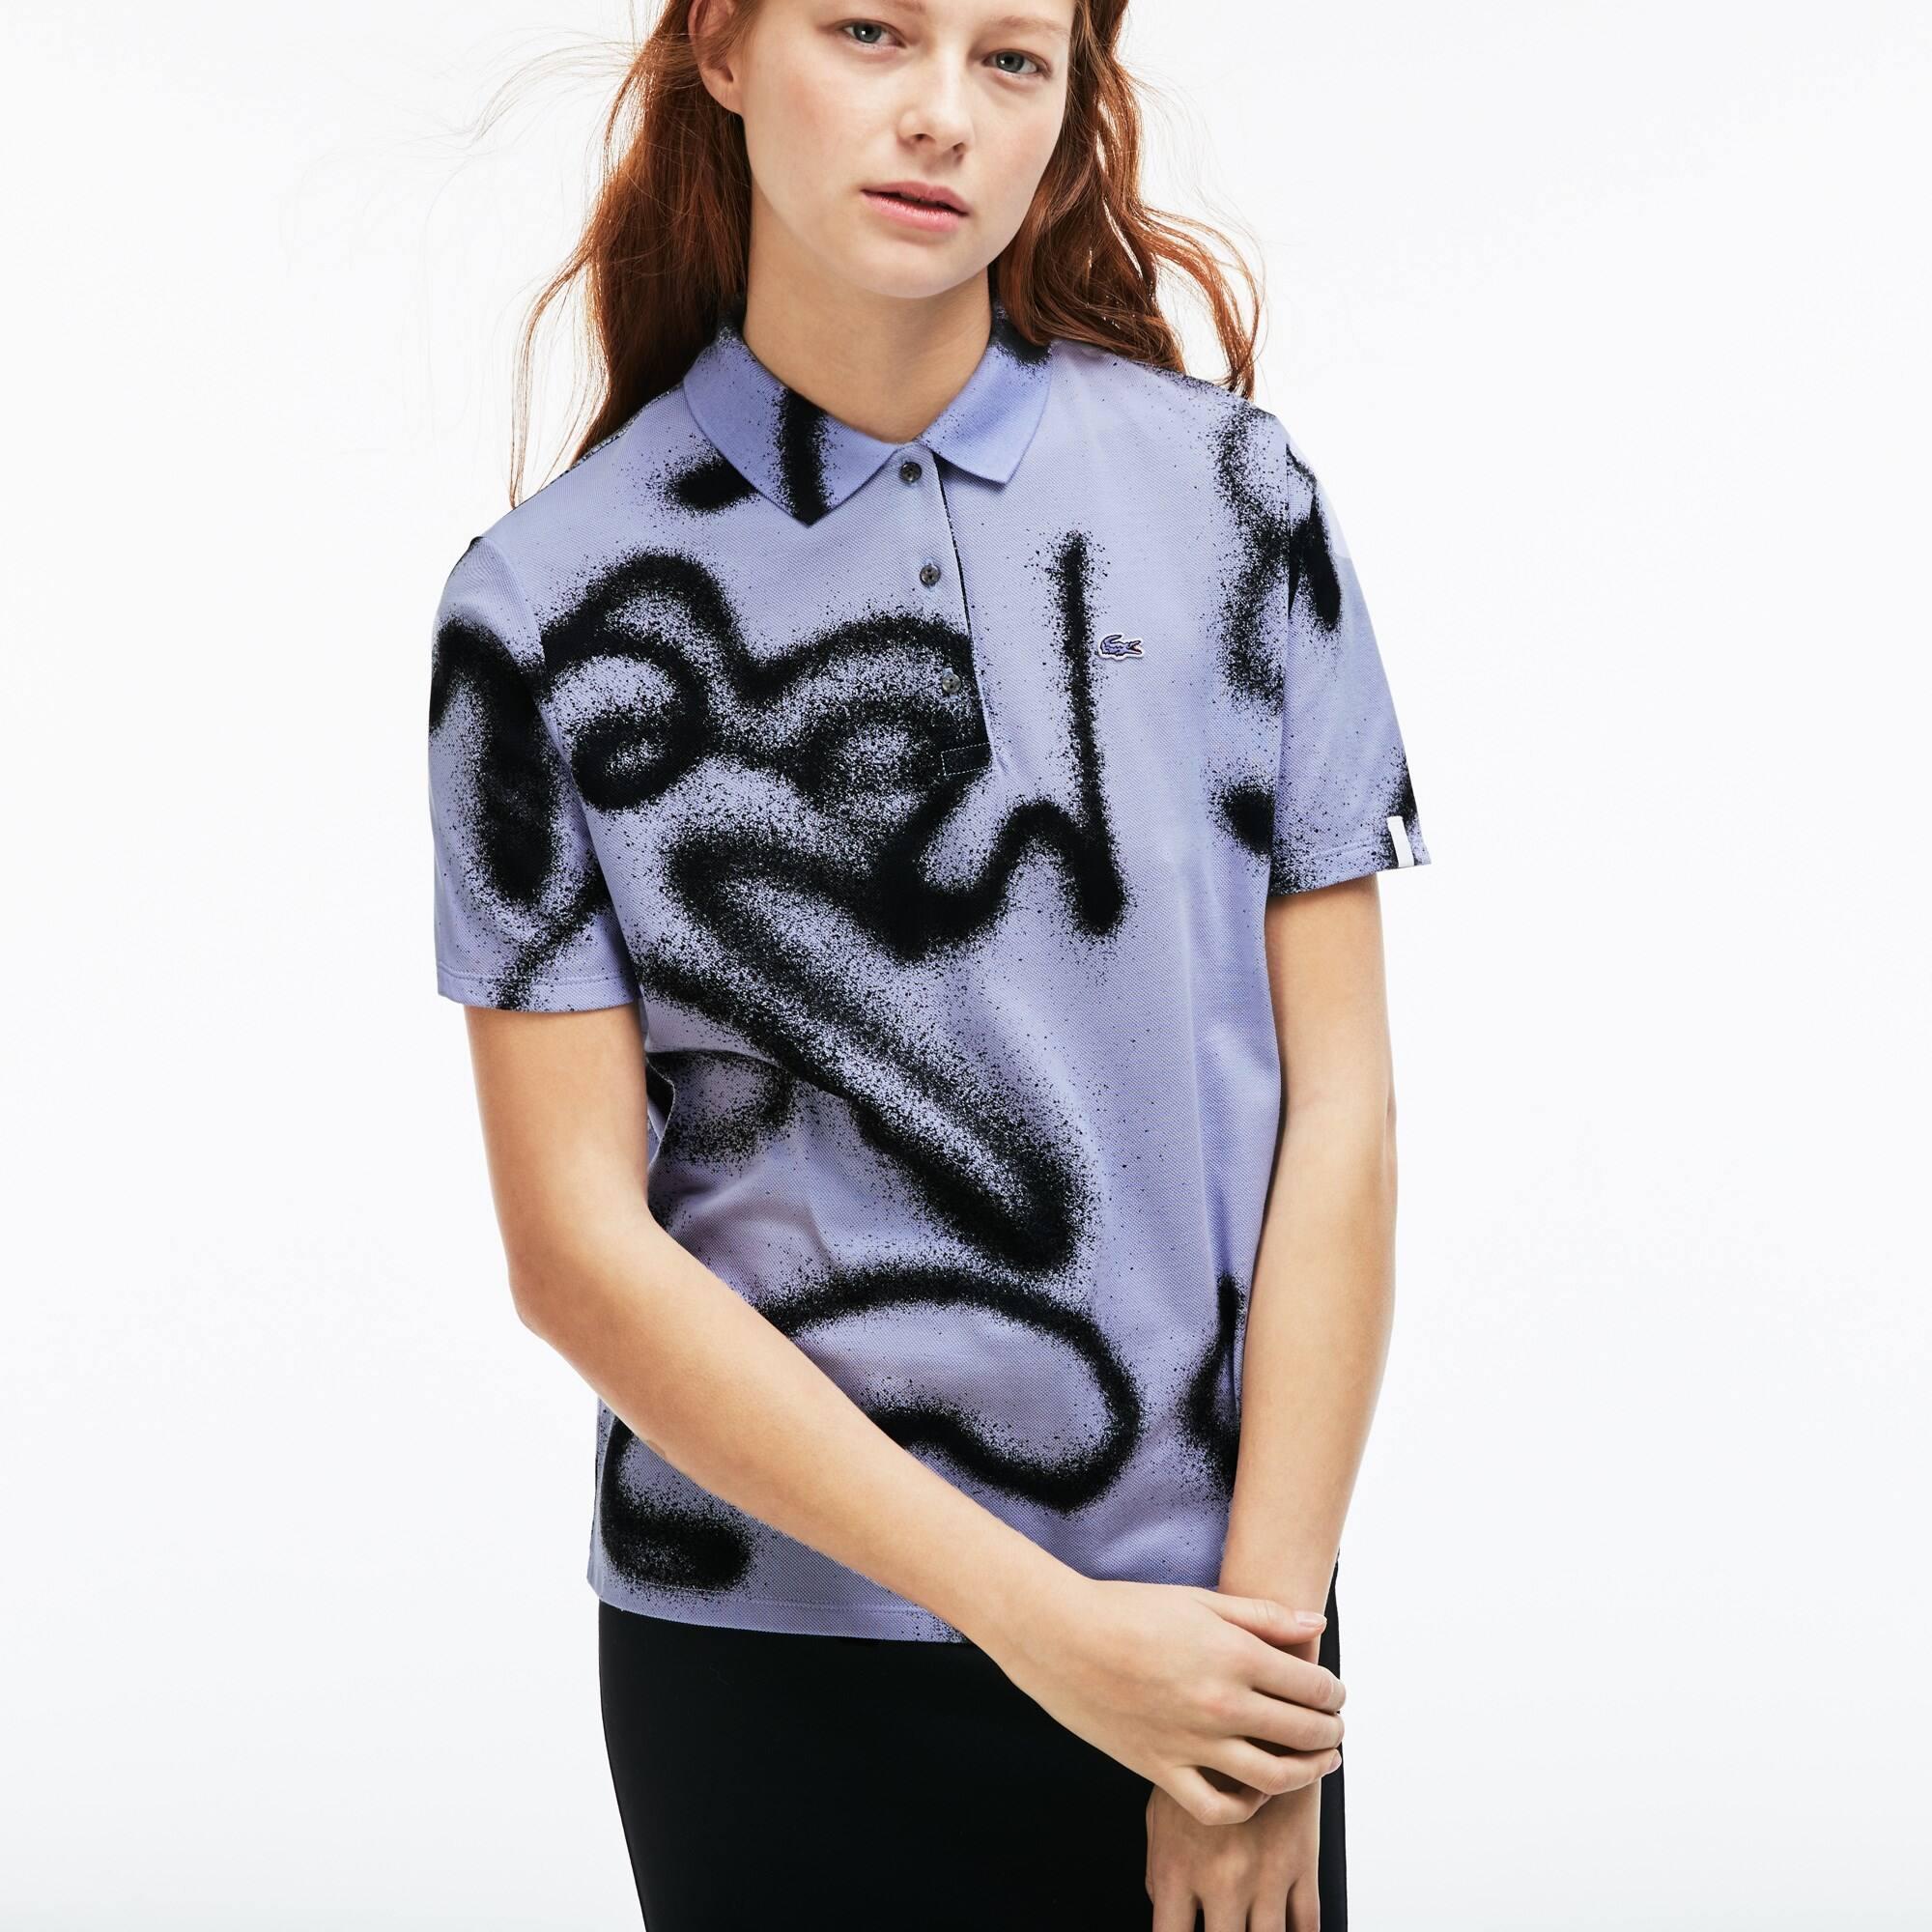 Damen LACOSTE LIVE Poloshirt mit Print und Mini-Piqué